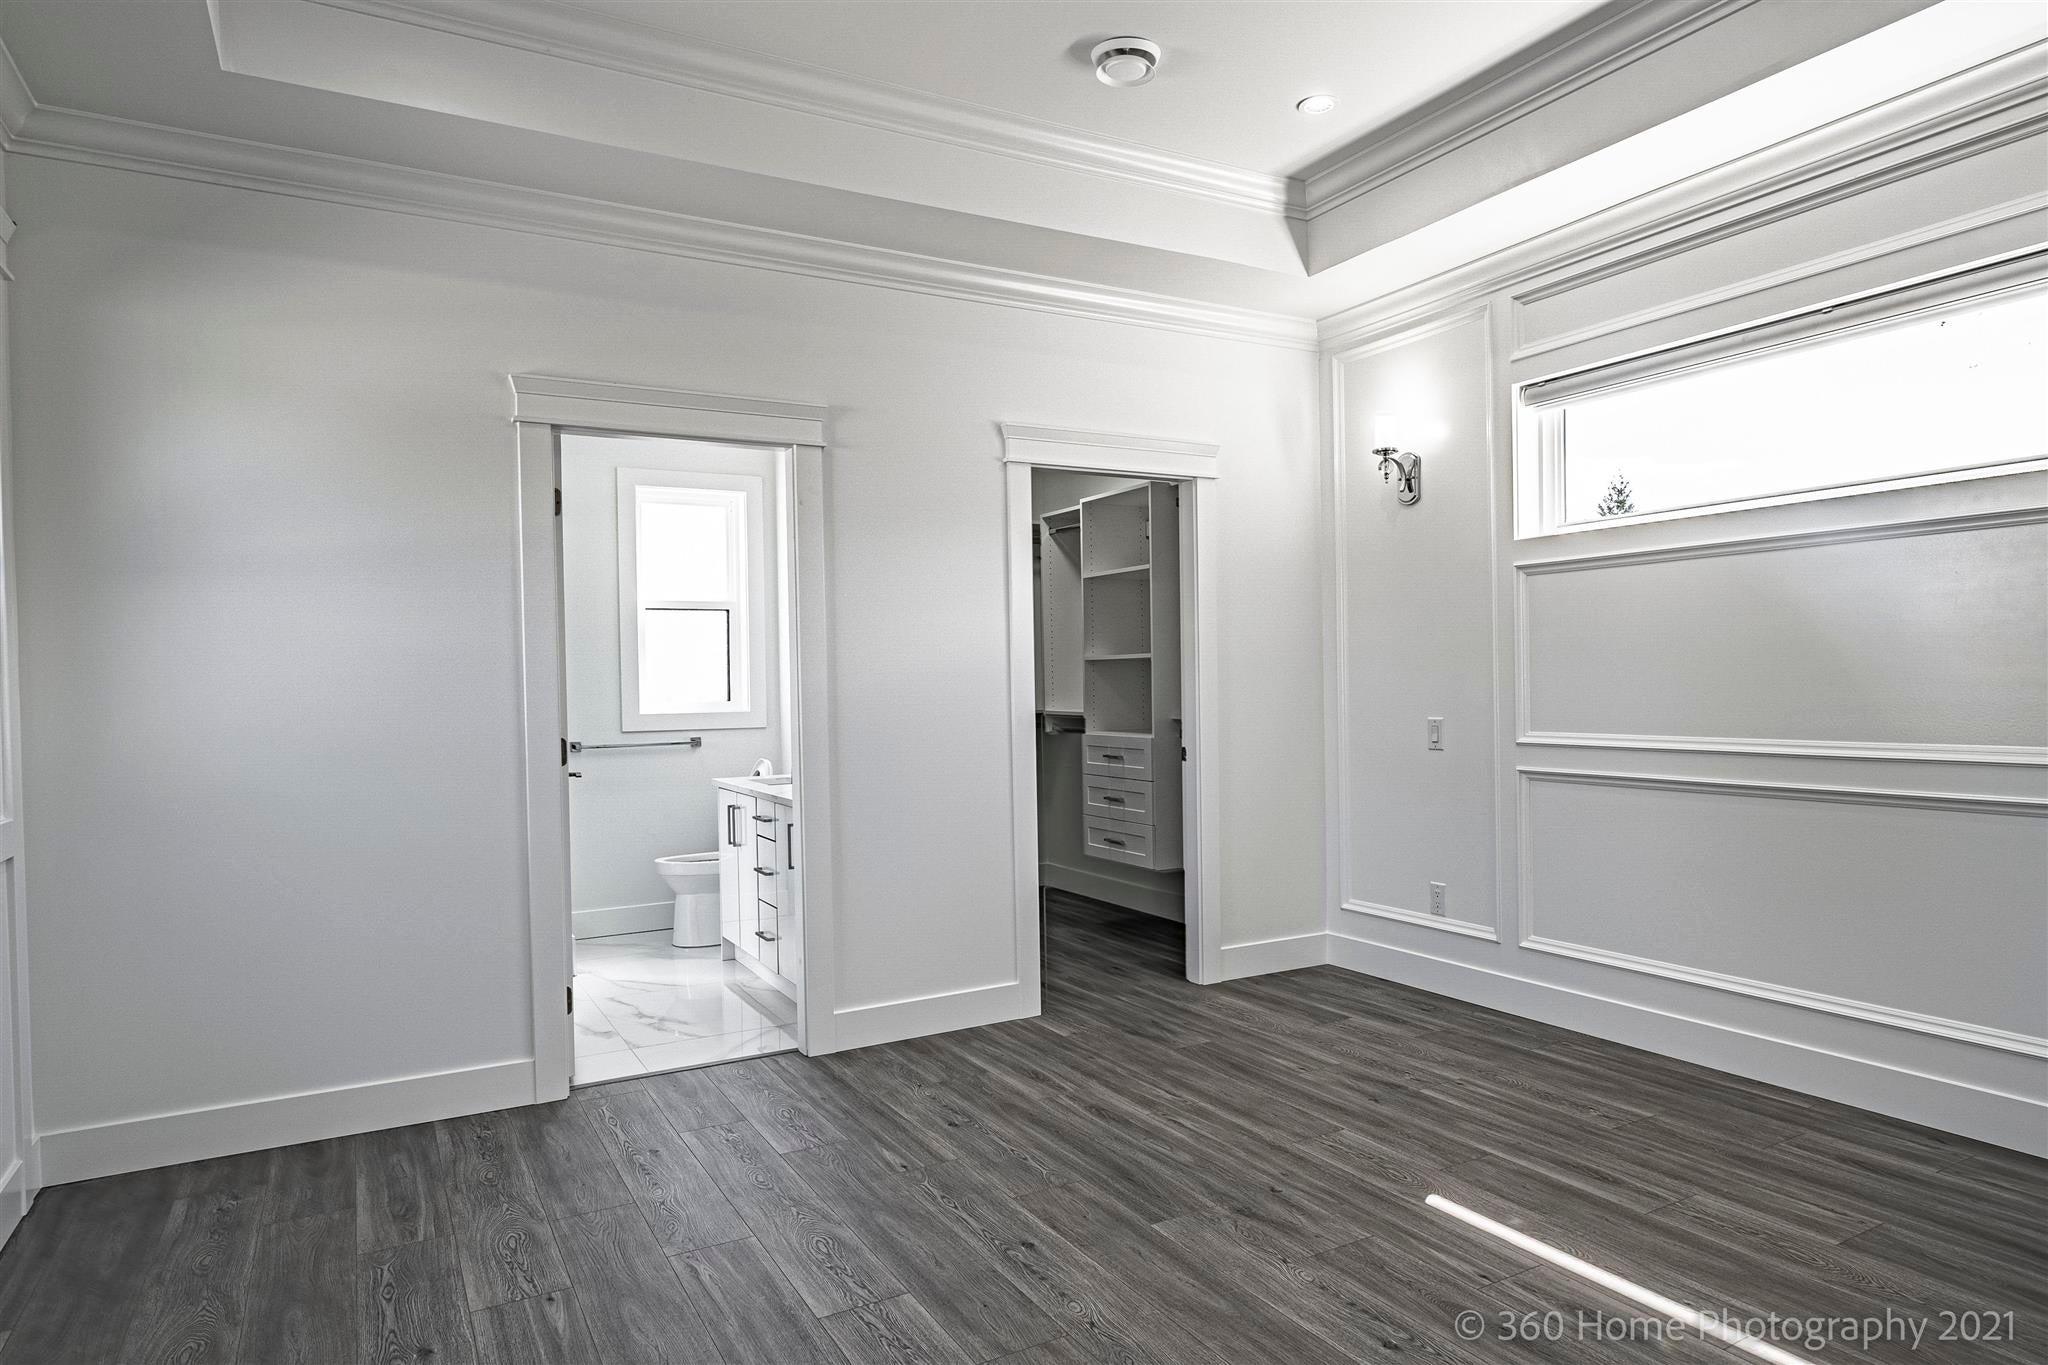 13050 101B AVENUE - Cedar Hills House/Single Family for sale, 5 Bedrooms (R2602208) - #21